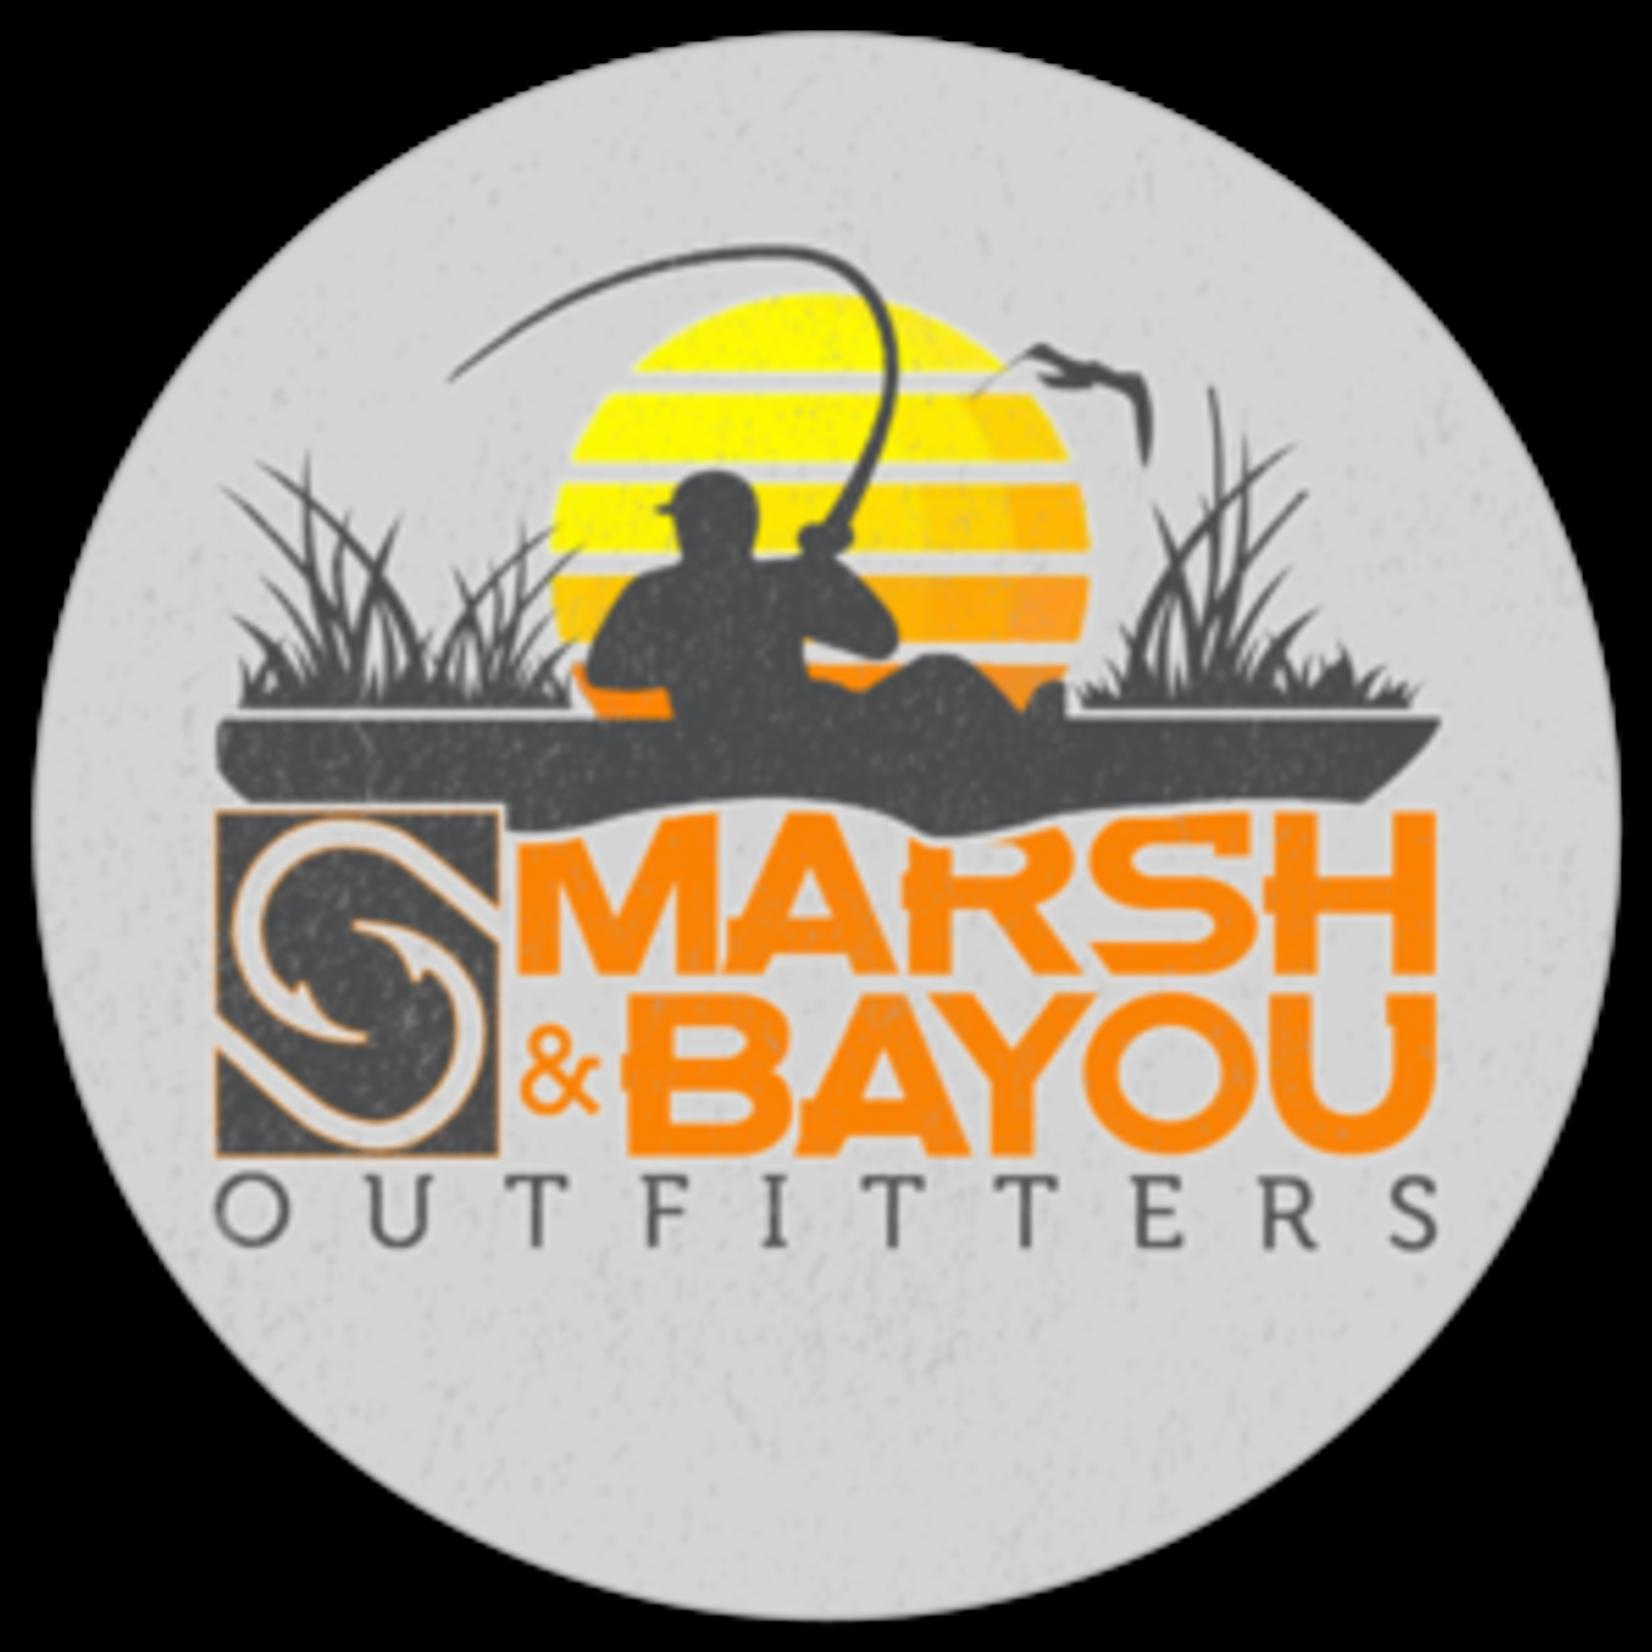 Marsh & Bayou Outfitters | Kayak Sunset Decal